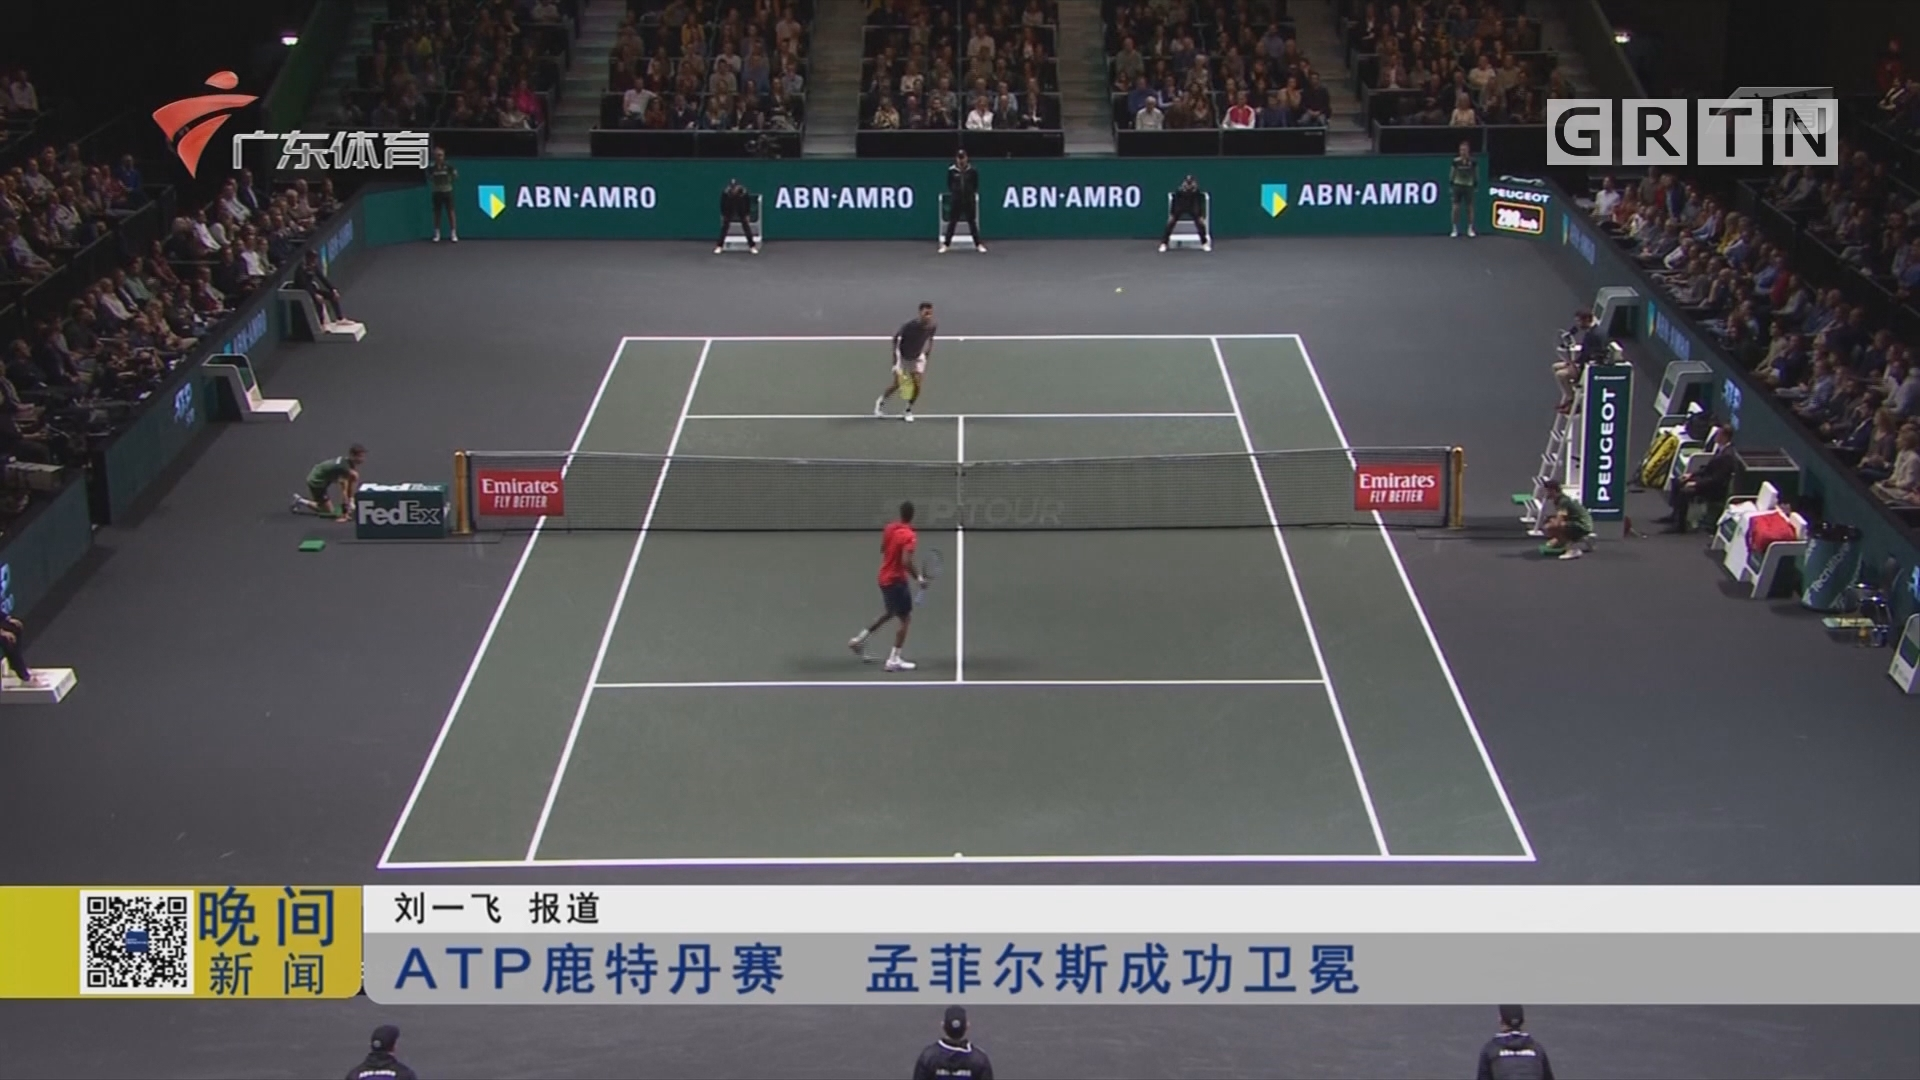 ATP鹿特丹赛 孟菲尔斯成功卫冕